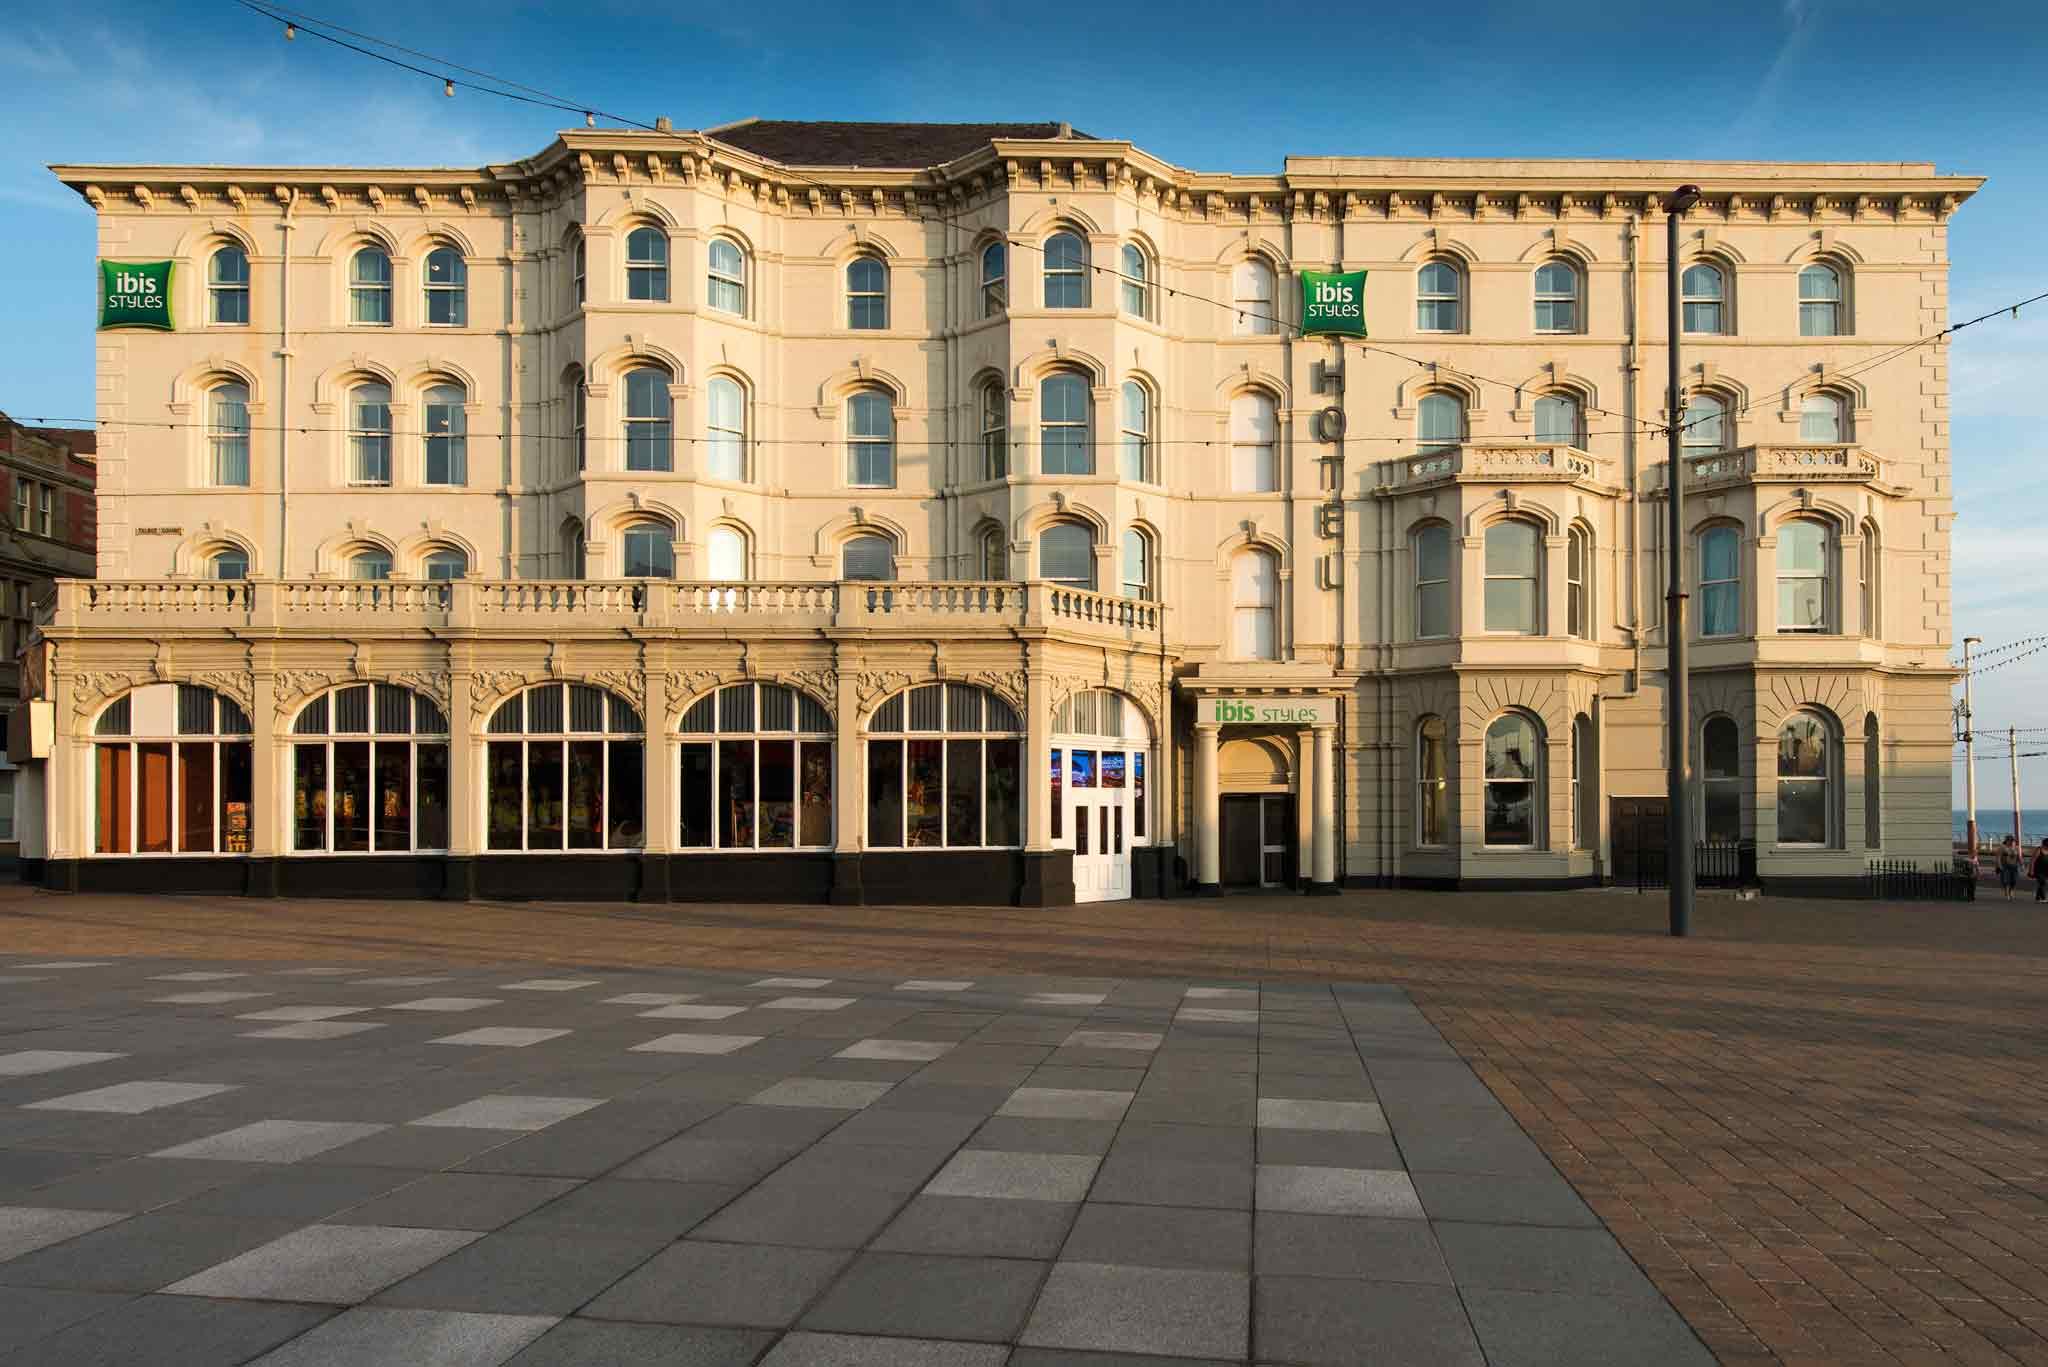 Hotels Near The Winter Gardens Blackpool Part - 42: Hotel - Ibis Styles Blackpool